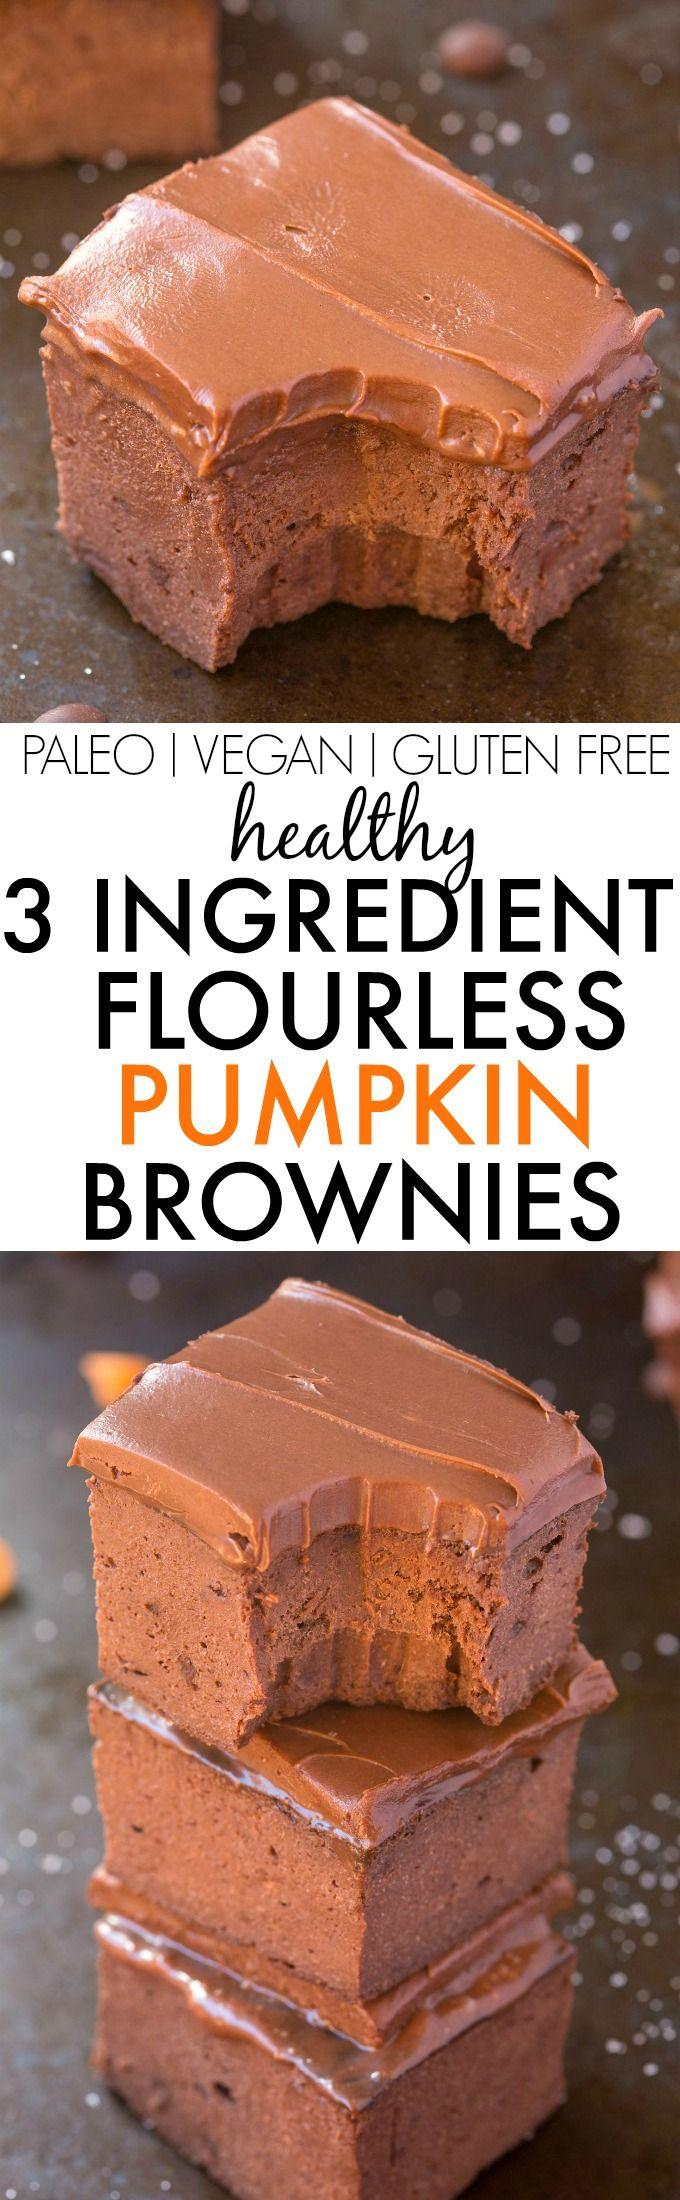 Healthy 3 Ingredient FLOURLESS Pumpkin Brownies- SO easy, simple and fudgy- NO butter, NO flour, NO su